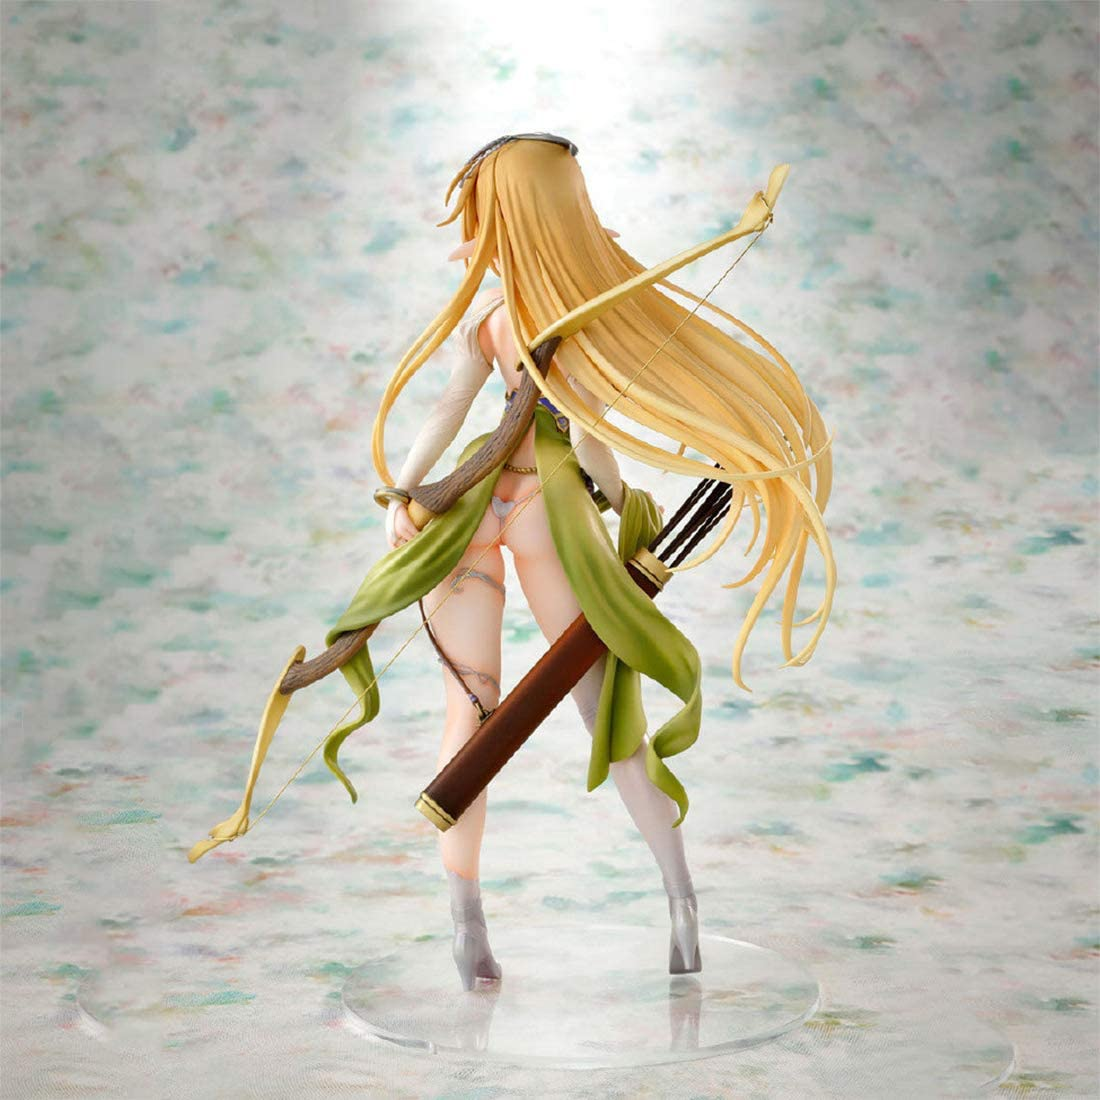 Cheveux Bleus Archeyle 1//6 27CM Figurine Manga Figurine PVC Anime Girl Figurine Manga Figurine Fille Garage Kit Figurine GODNECE Figurine Manga